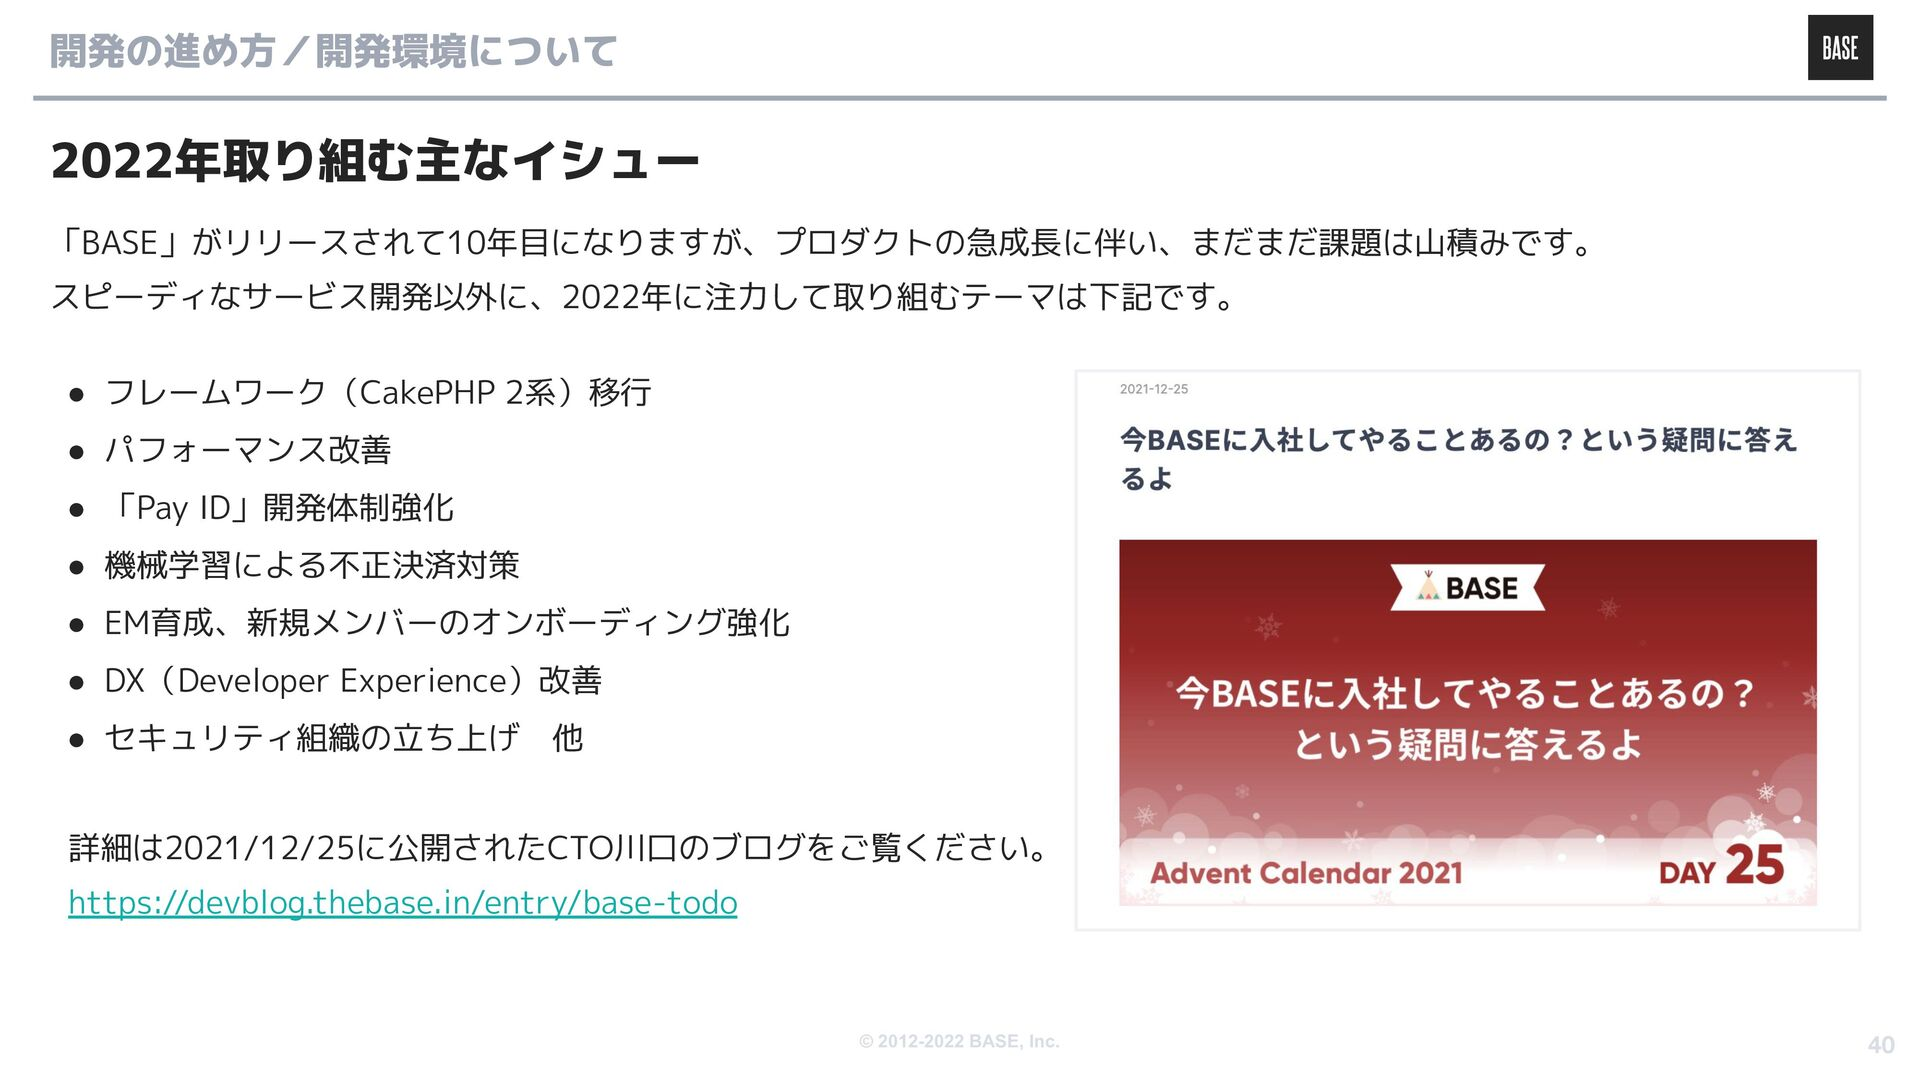 © 2012-2020 BASE, Inc. 登壇・テックブログの 執筆の推奨 カンファレンス...